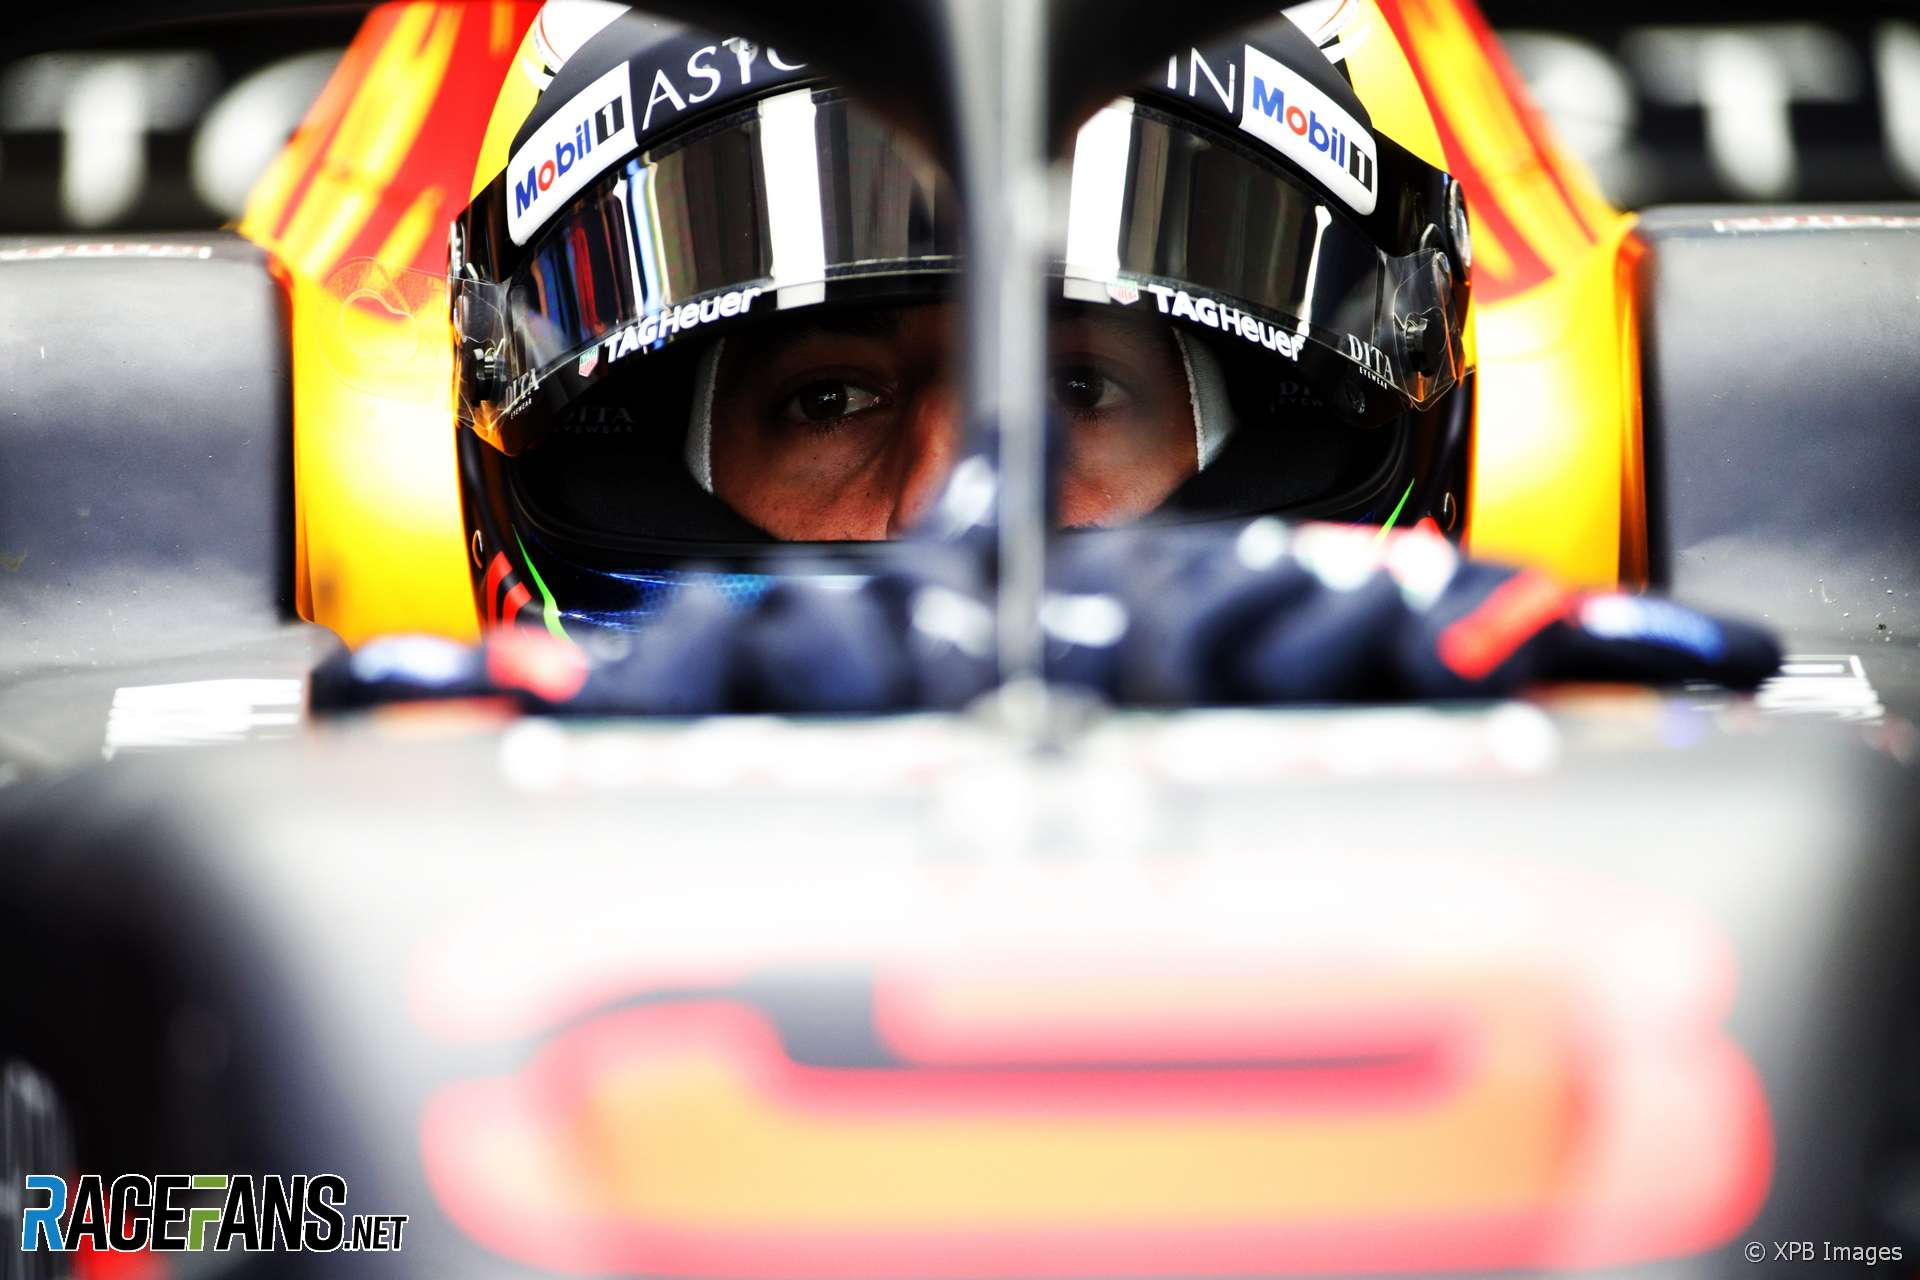 Daniel Ricciardo, Red Bull, Hungaroring, 2018